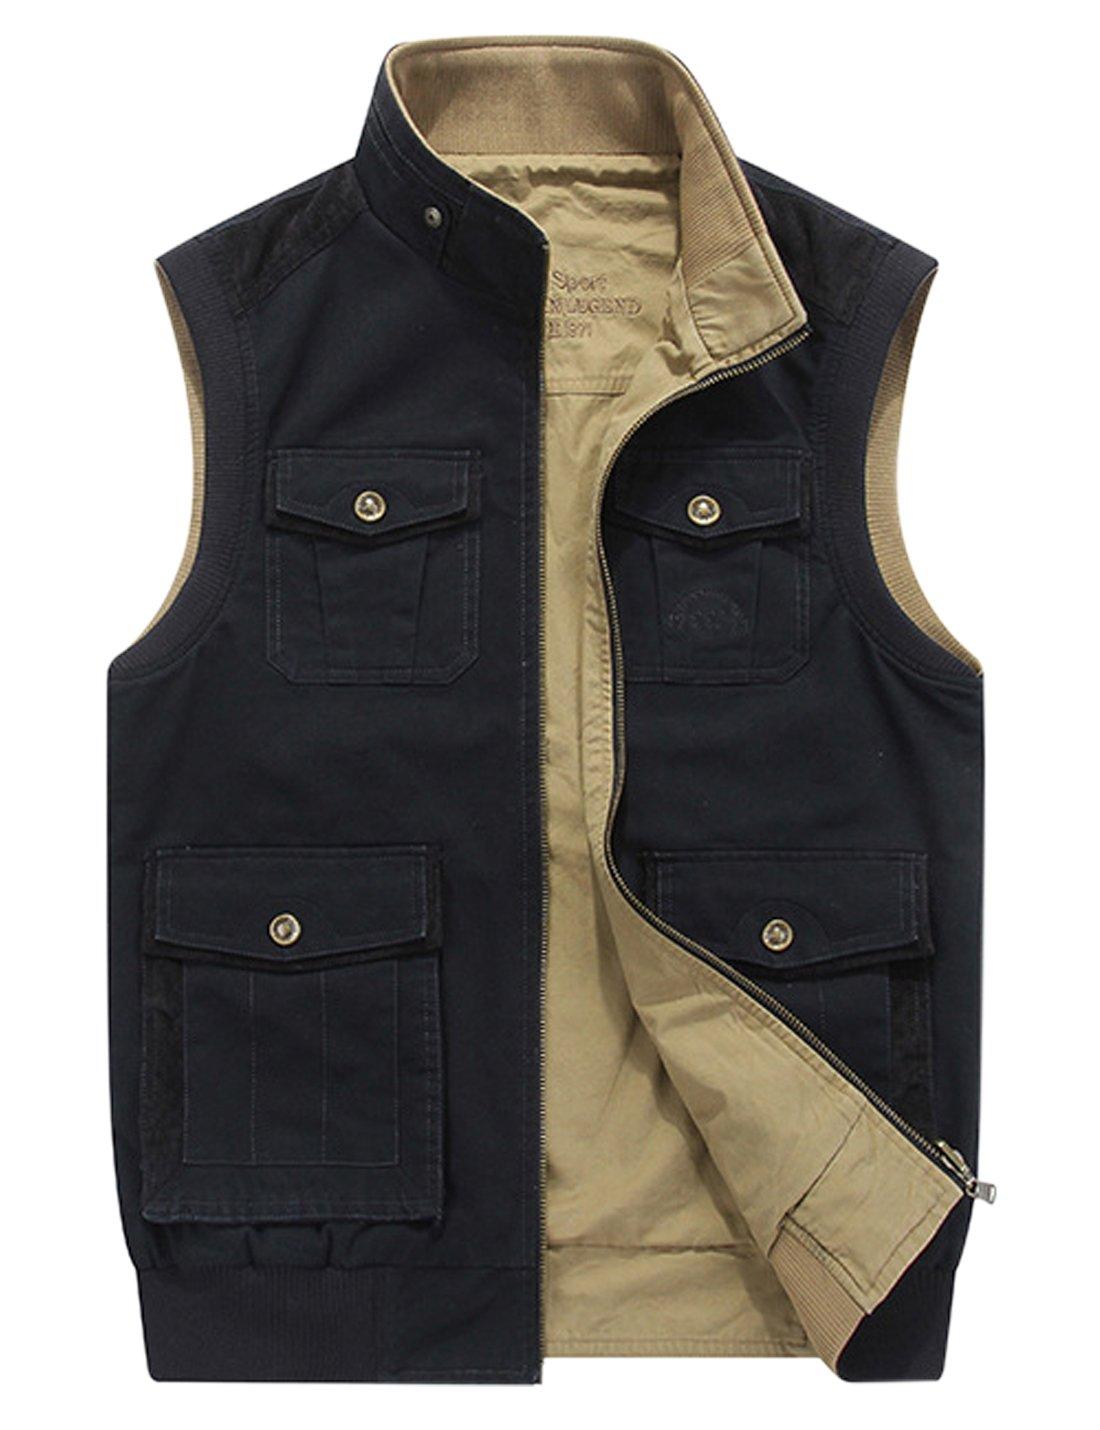 Gihuo Men's Reversible Cotton Leisure Outdoor Pockets Fish Photo Journalist Vest (XL, Black)